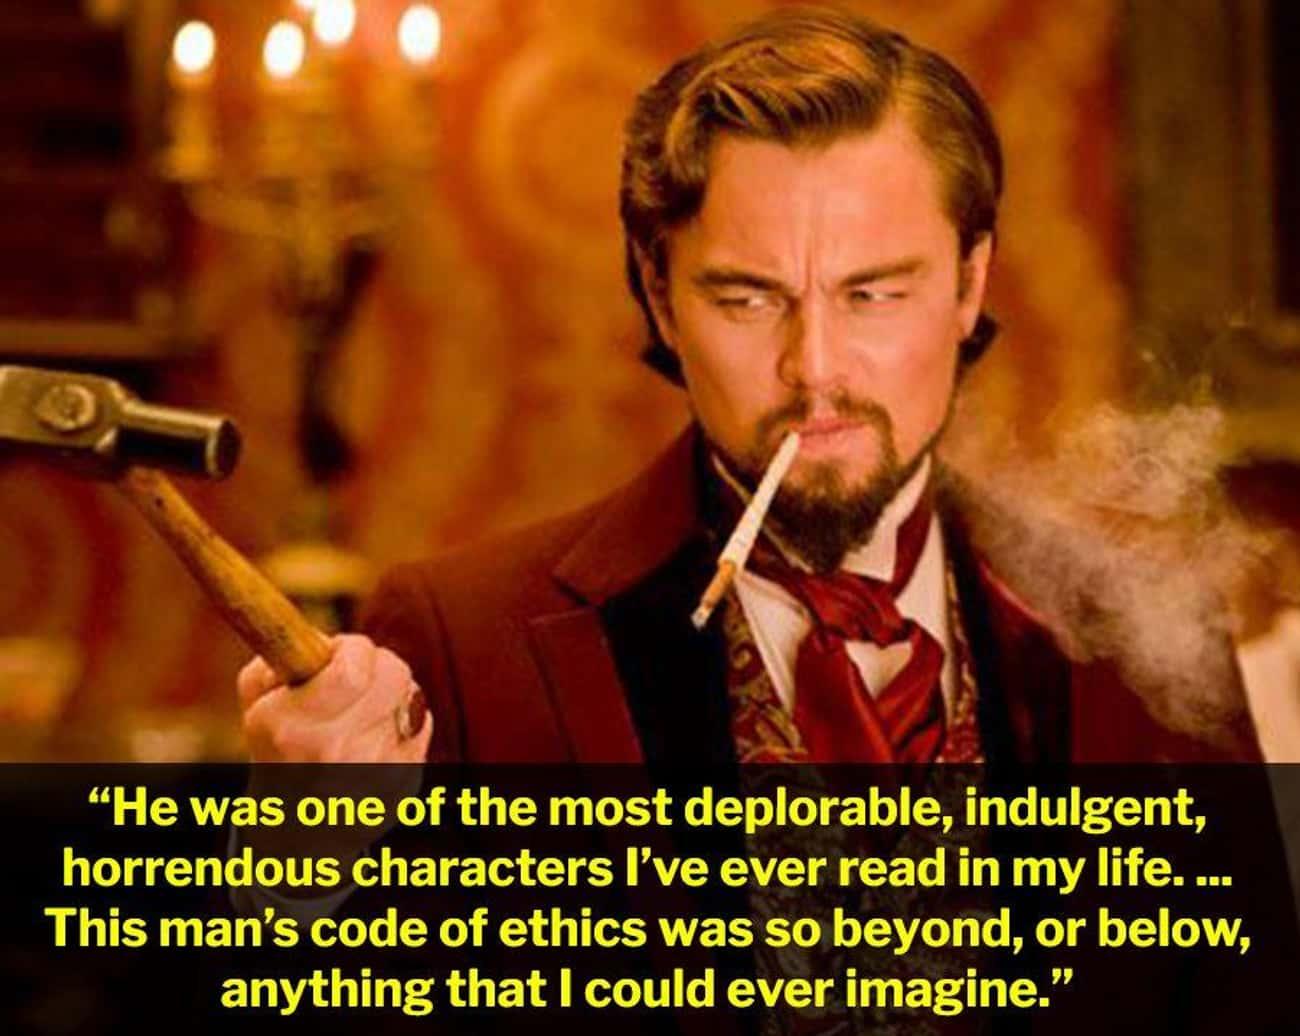 Leonardo DiCaprio In 'Django Unchained'